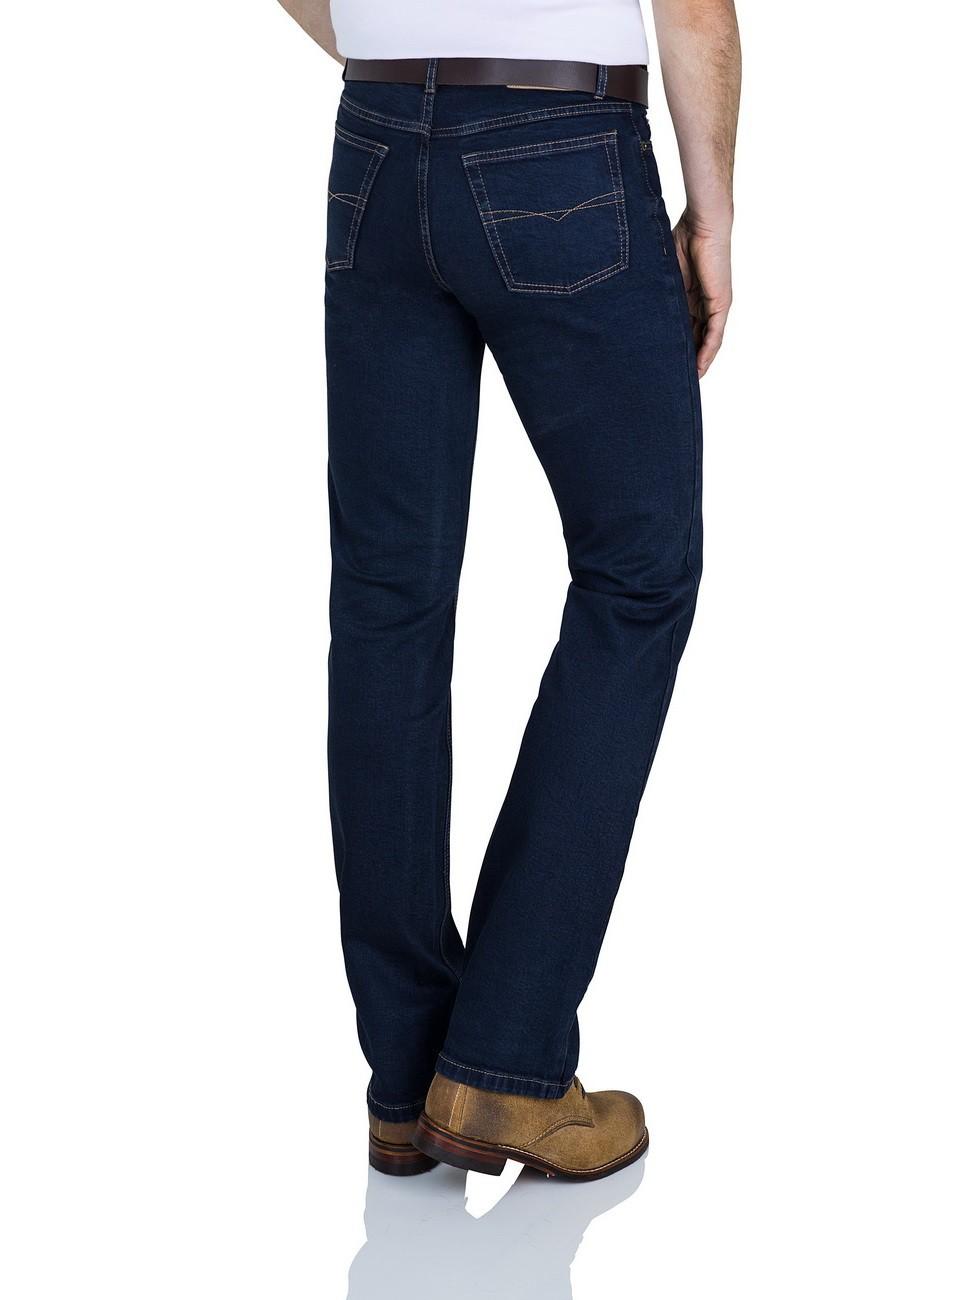 paddock-s-herren-jeans-ranger-slim-fit-blau-blue-black